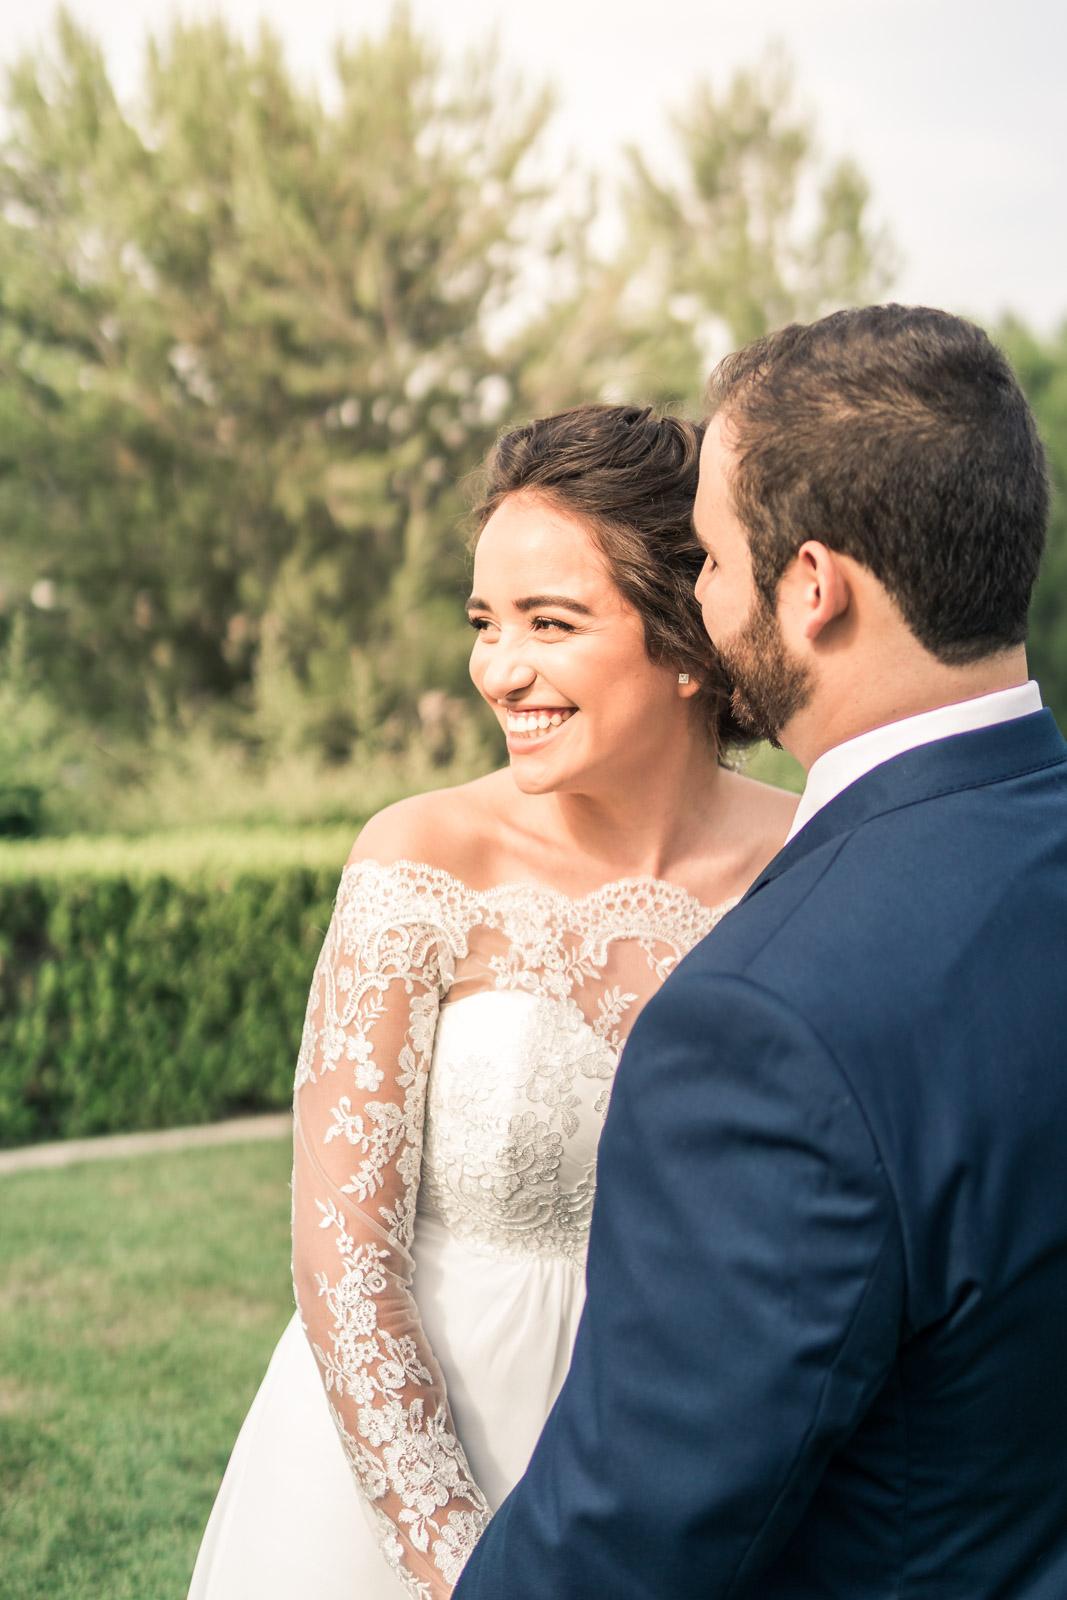 80_Angel-Brea-Orange-County_Joseph-Barber-Wedding-Photography.jpg